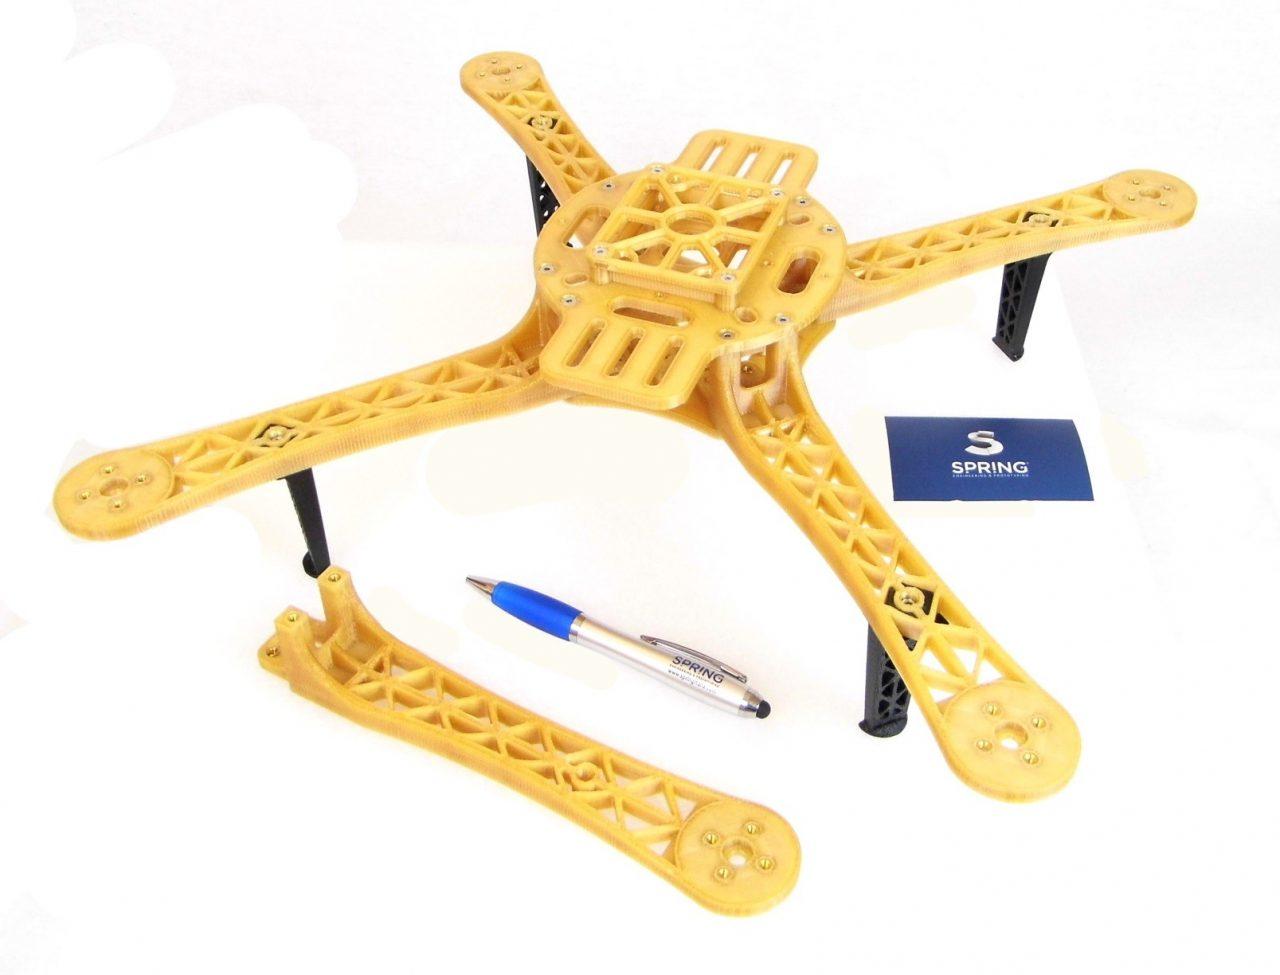 drone-spring-1280x975.jpg